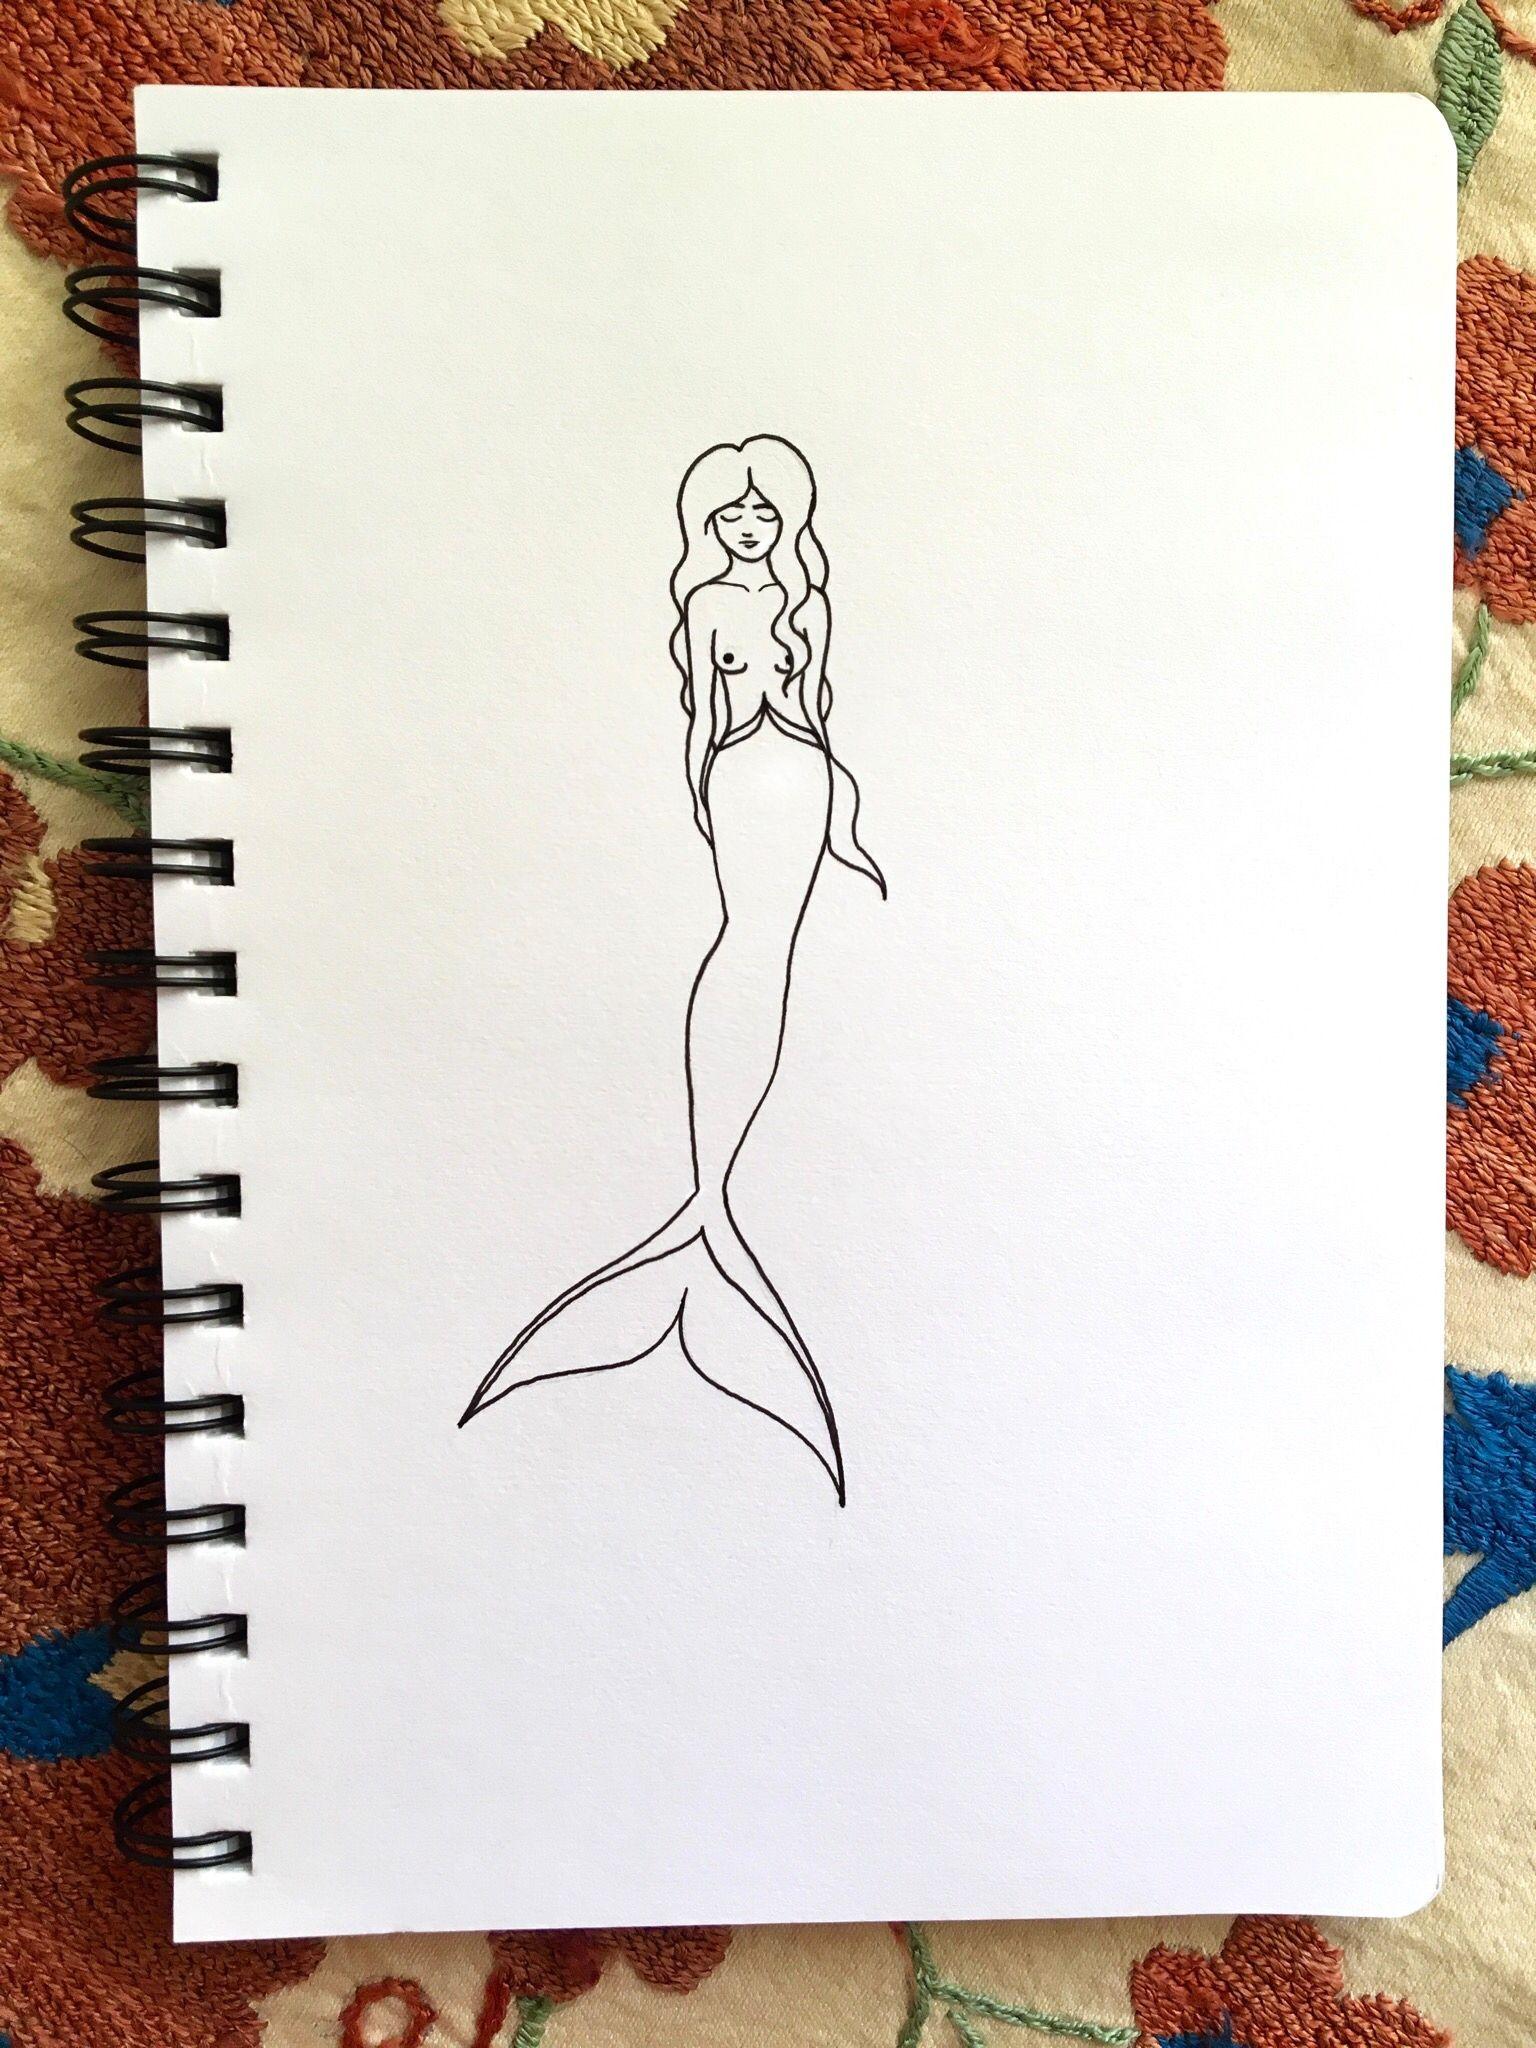 Mermaid pen line drawing #art #sketch #drawingideas #mermaid #tattoo